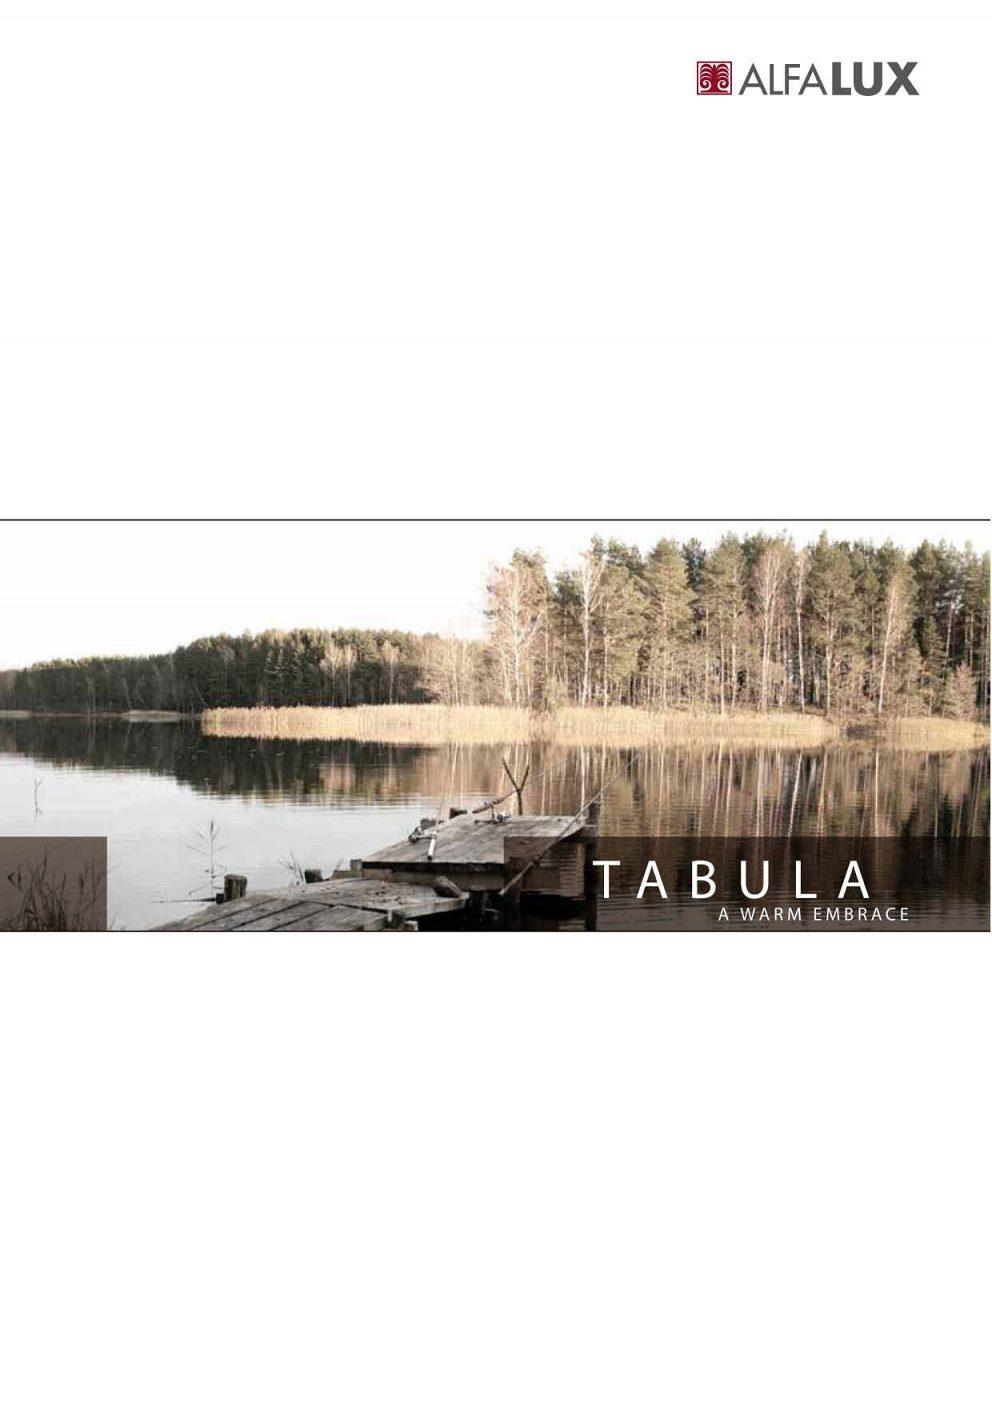 Alfalux - Tabula